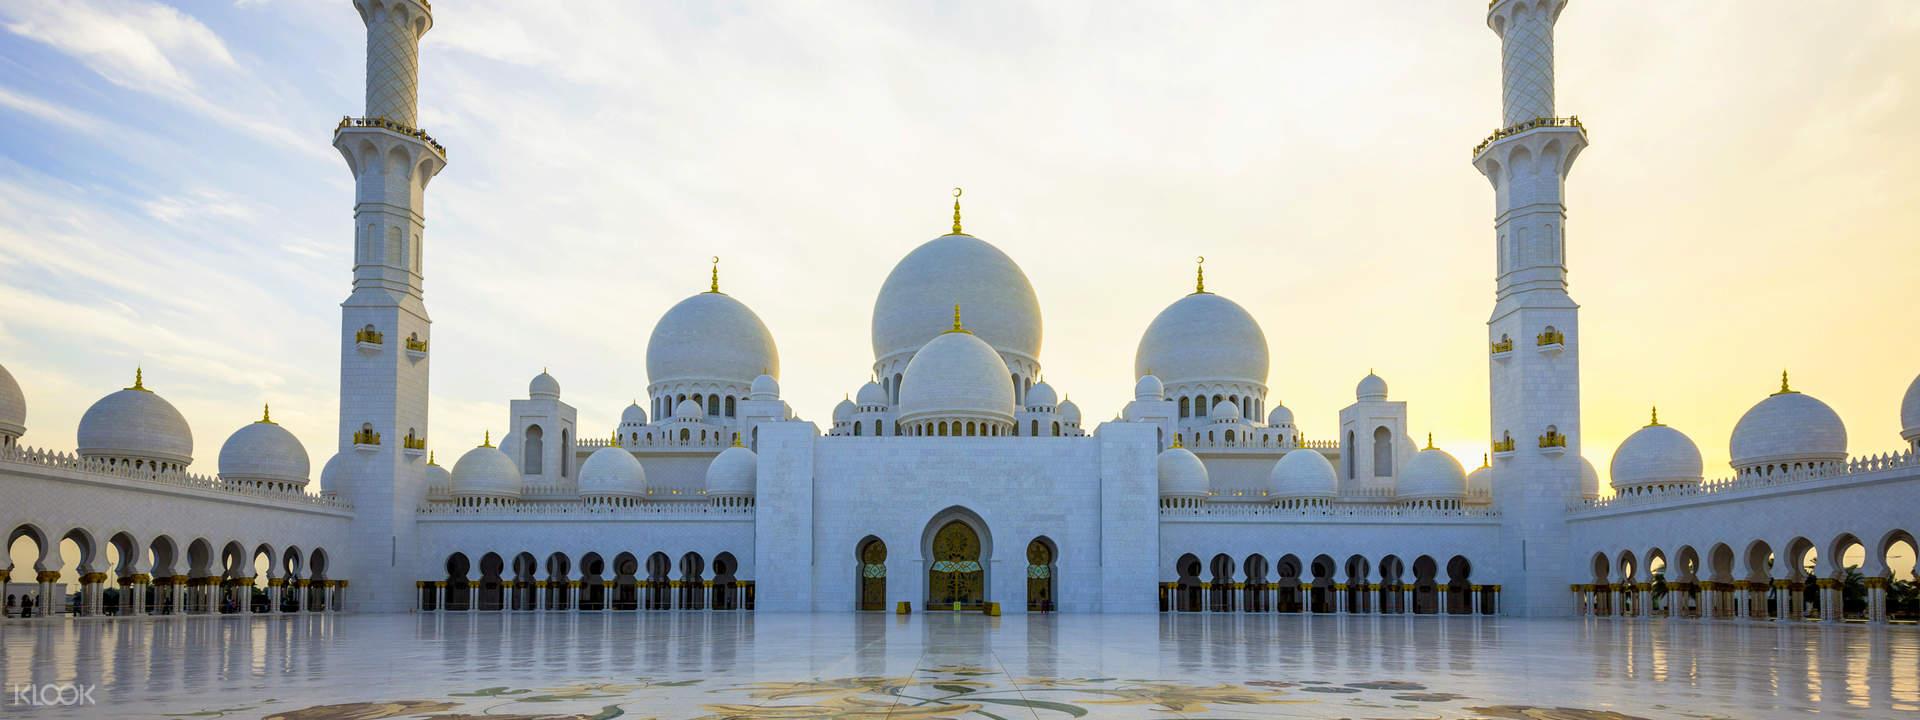 Abu Dhabi Full Day Tour from Dubai - Klook